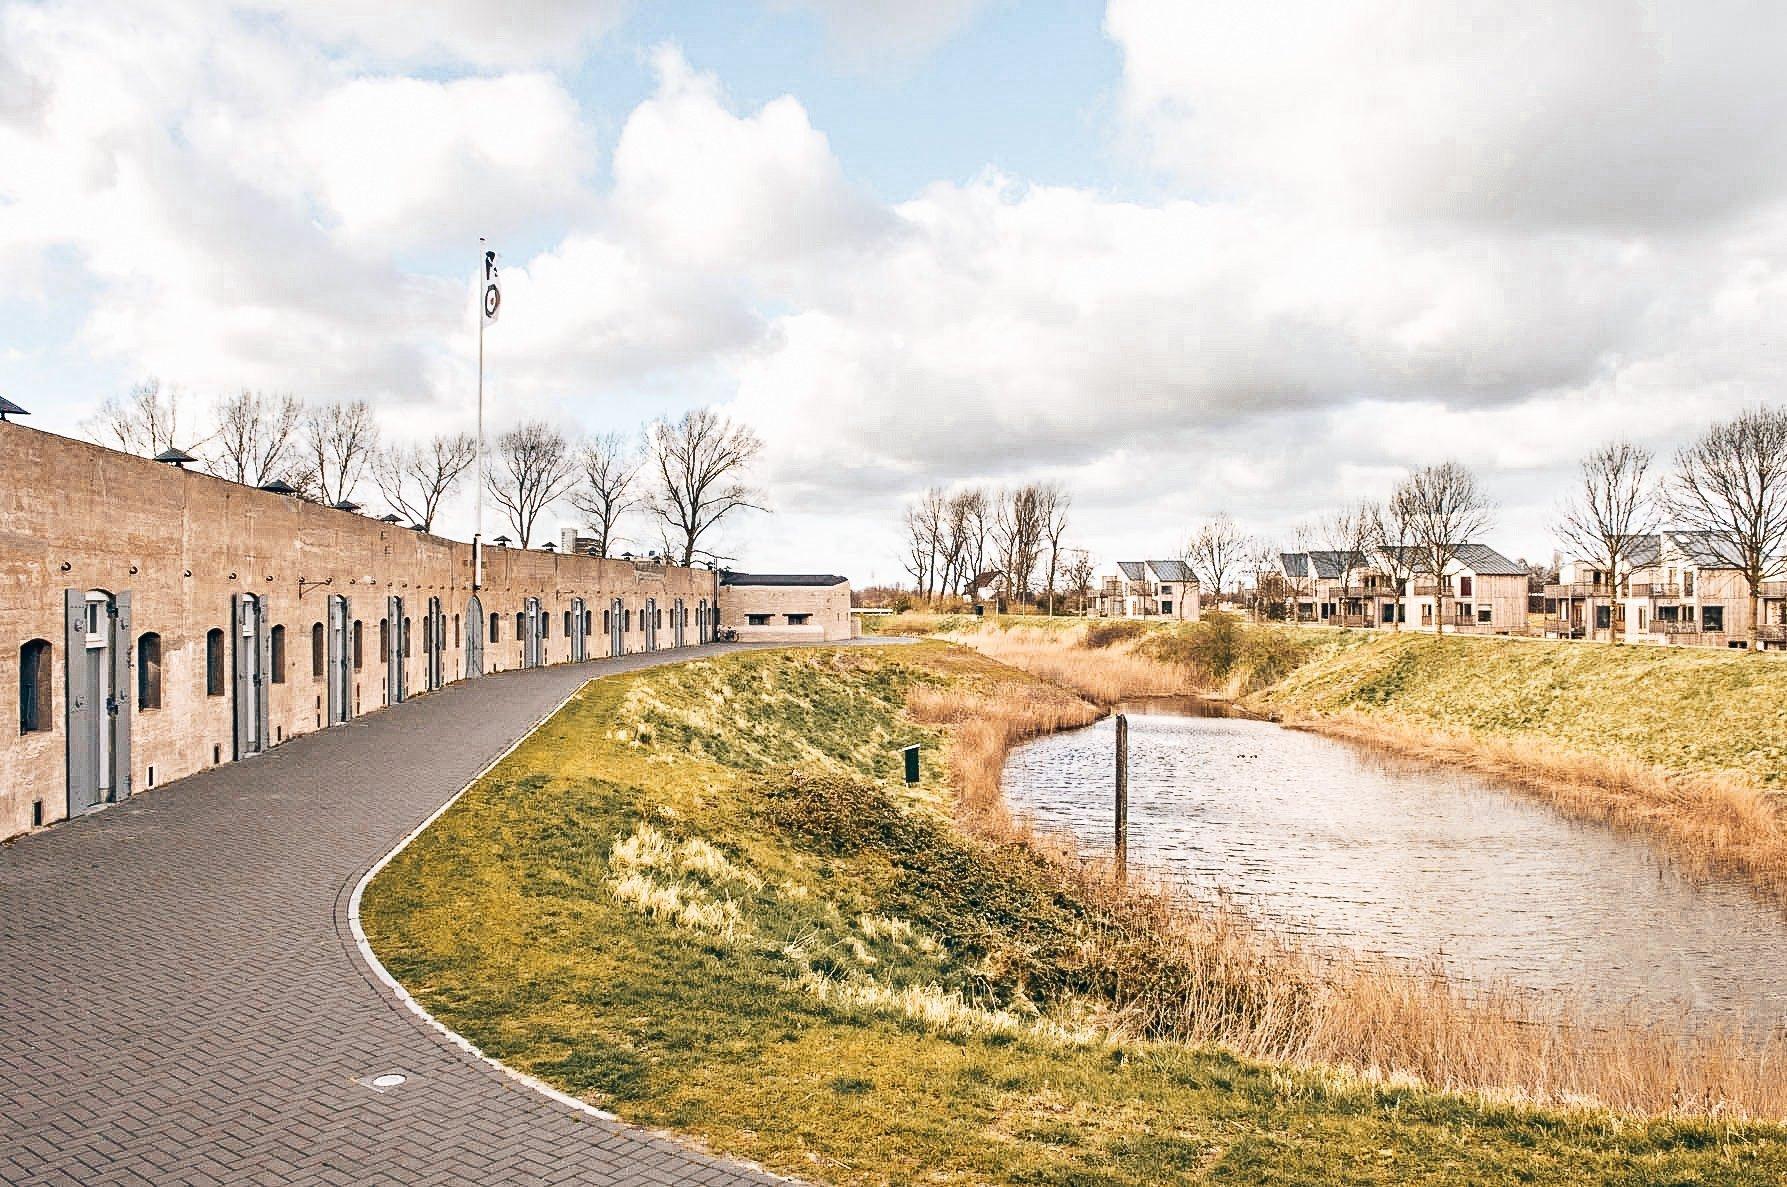 Tolmann's Dutch Dry Gin, Tolmann's Distillery locatie, Fort van Vijfhuizen, Alles over gin.